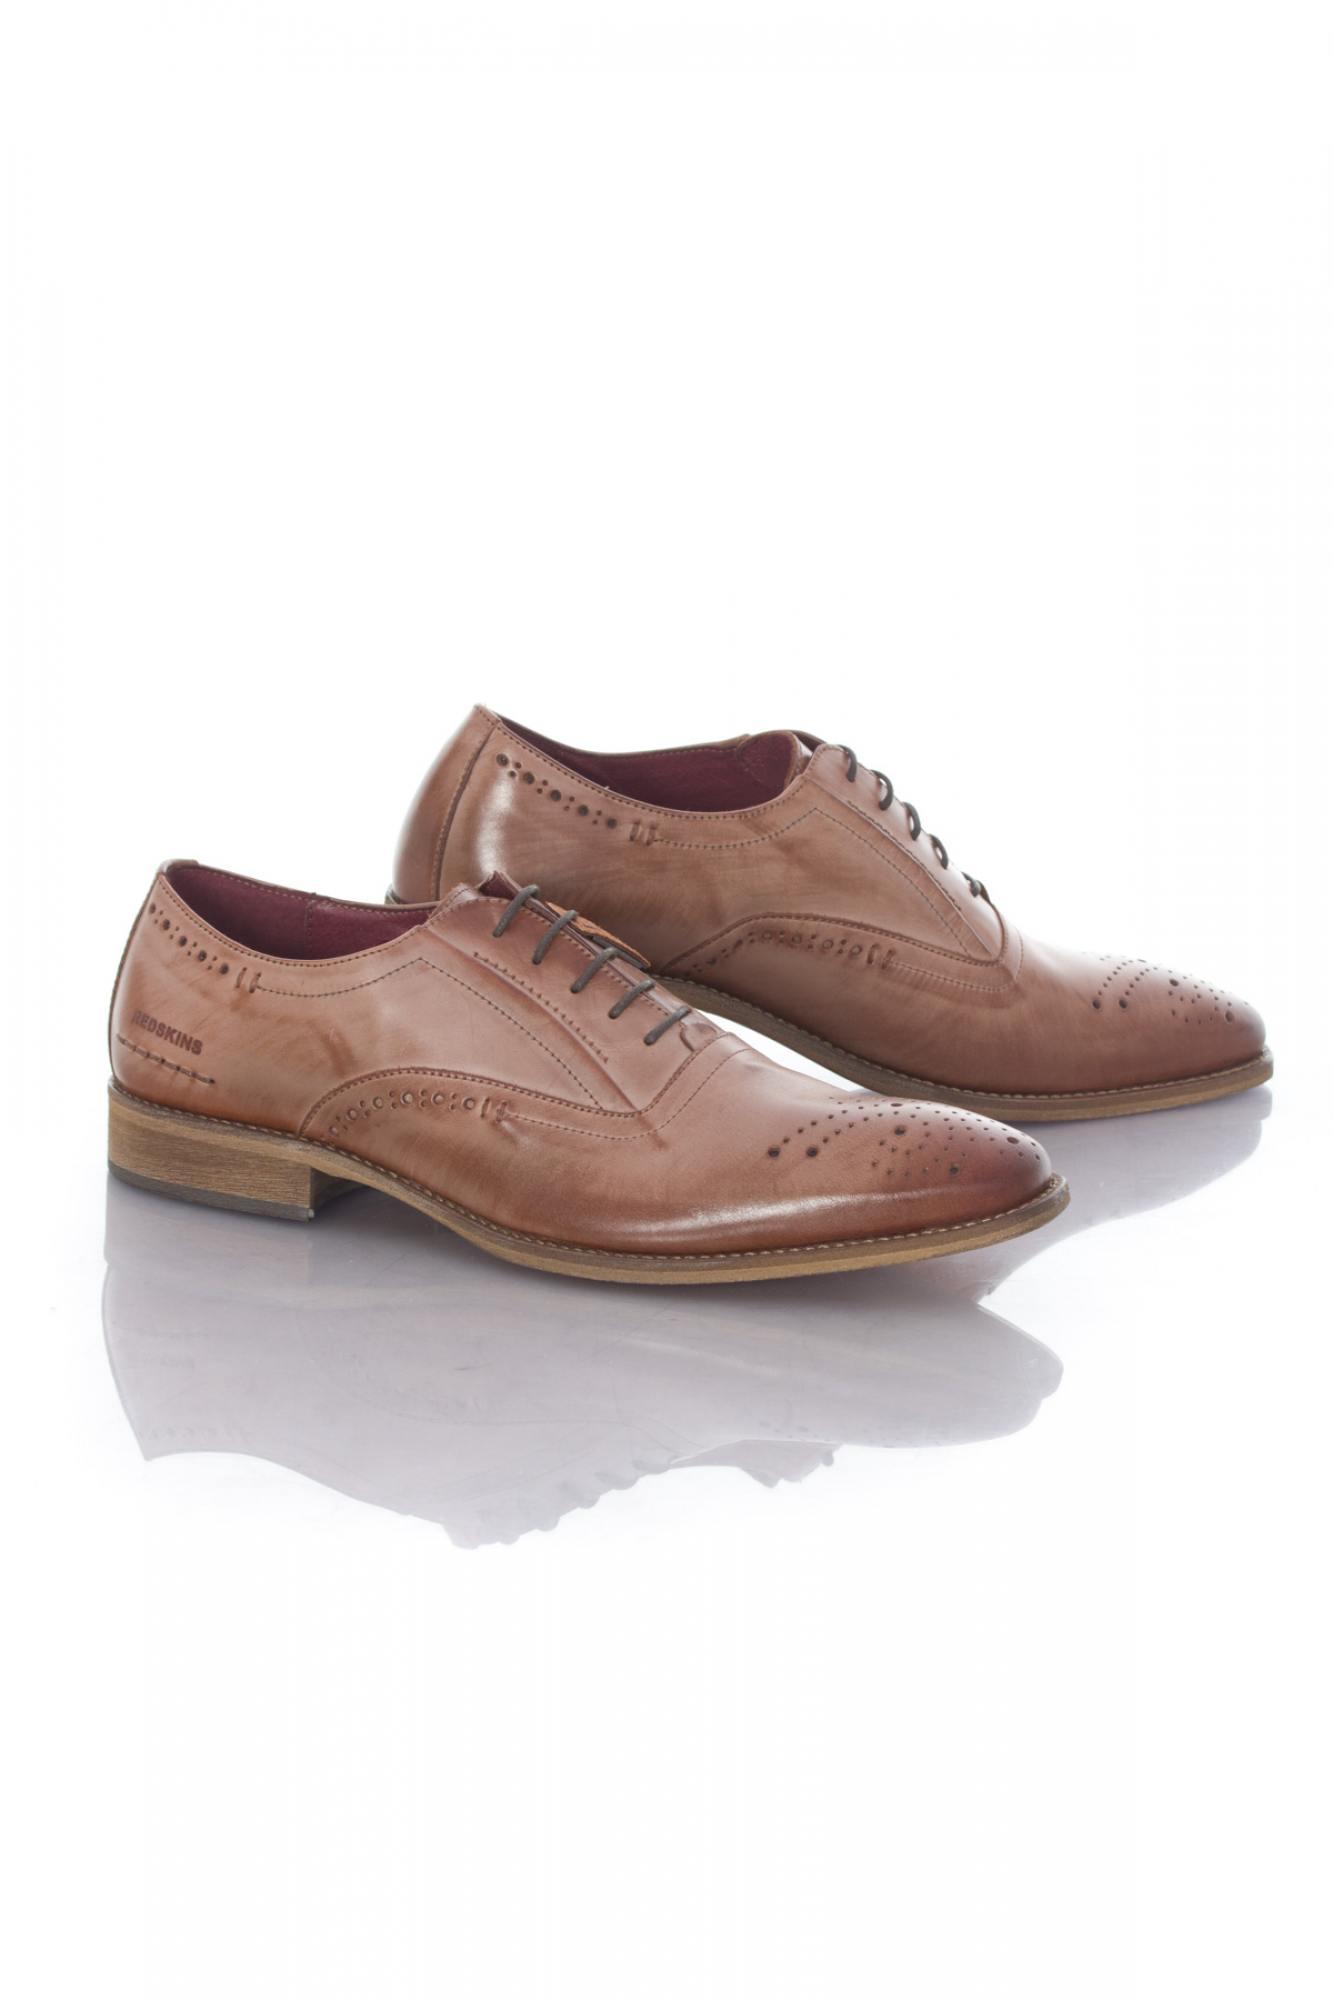 chaussure redskins homme nouvelle collection baskets montantes redskins minsk noir chaussures. Black Bedroom Furniture Sets. Home Design Ideas